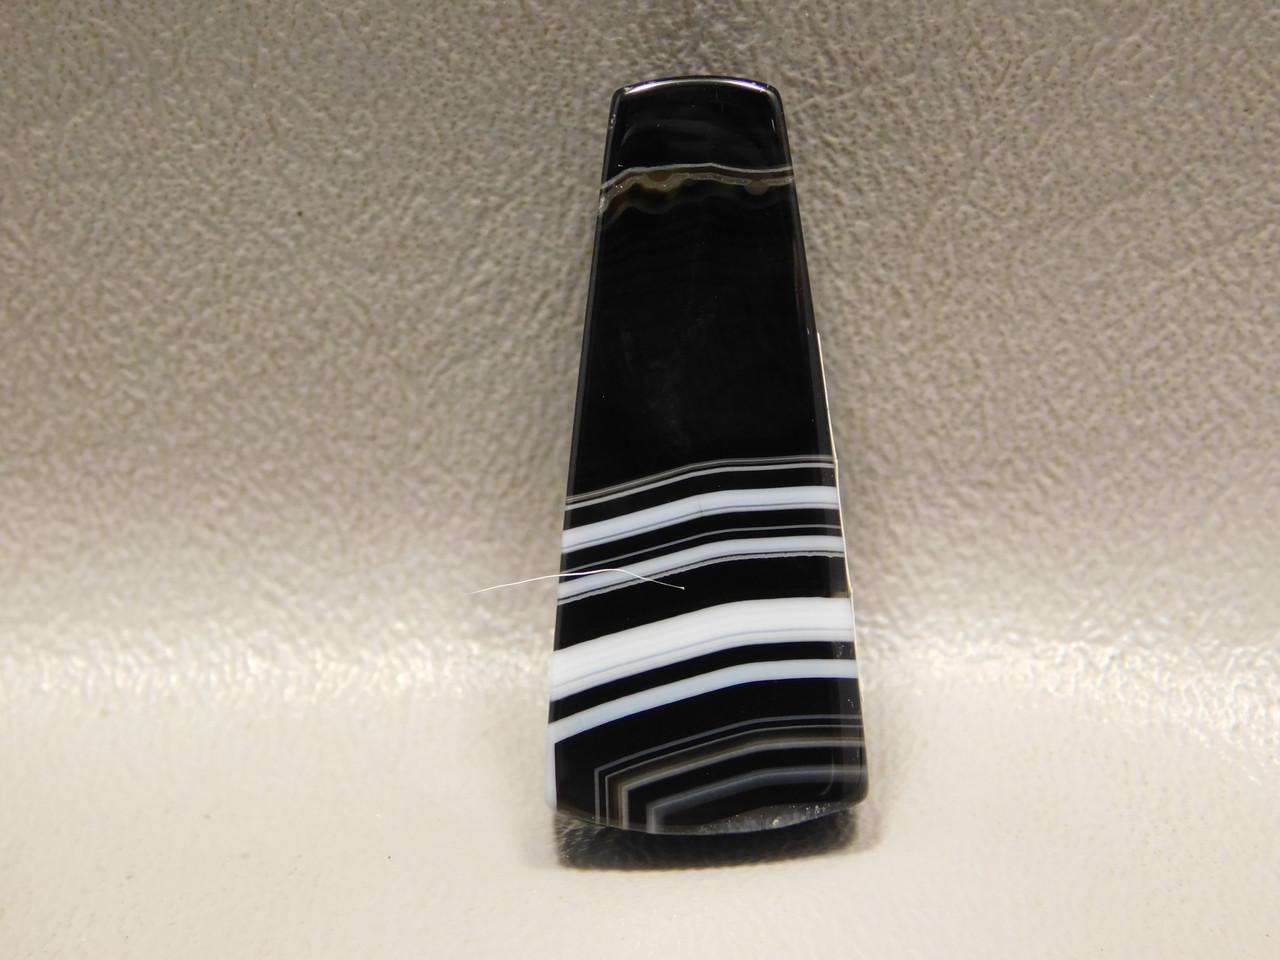 Tuxedo Agate Stone Bead Pendant #1